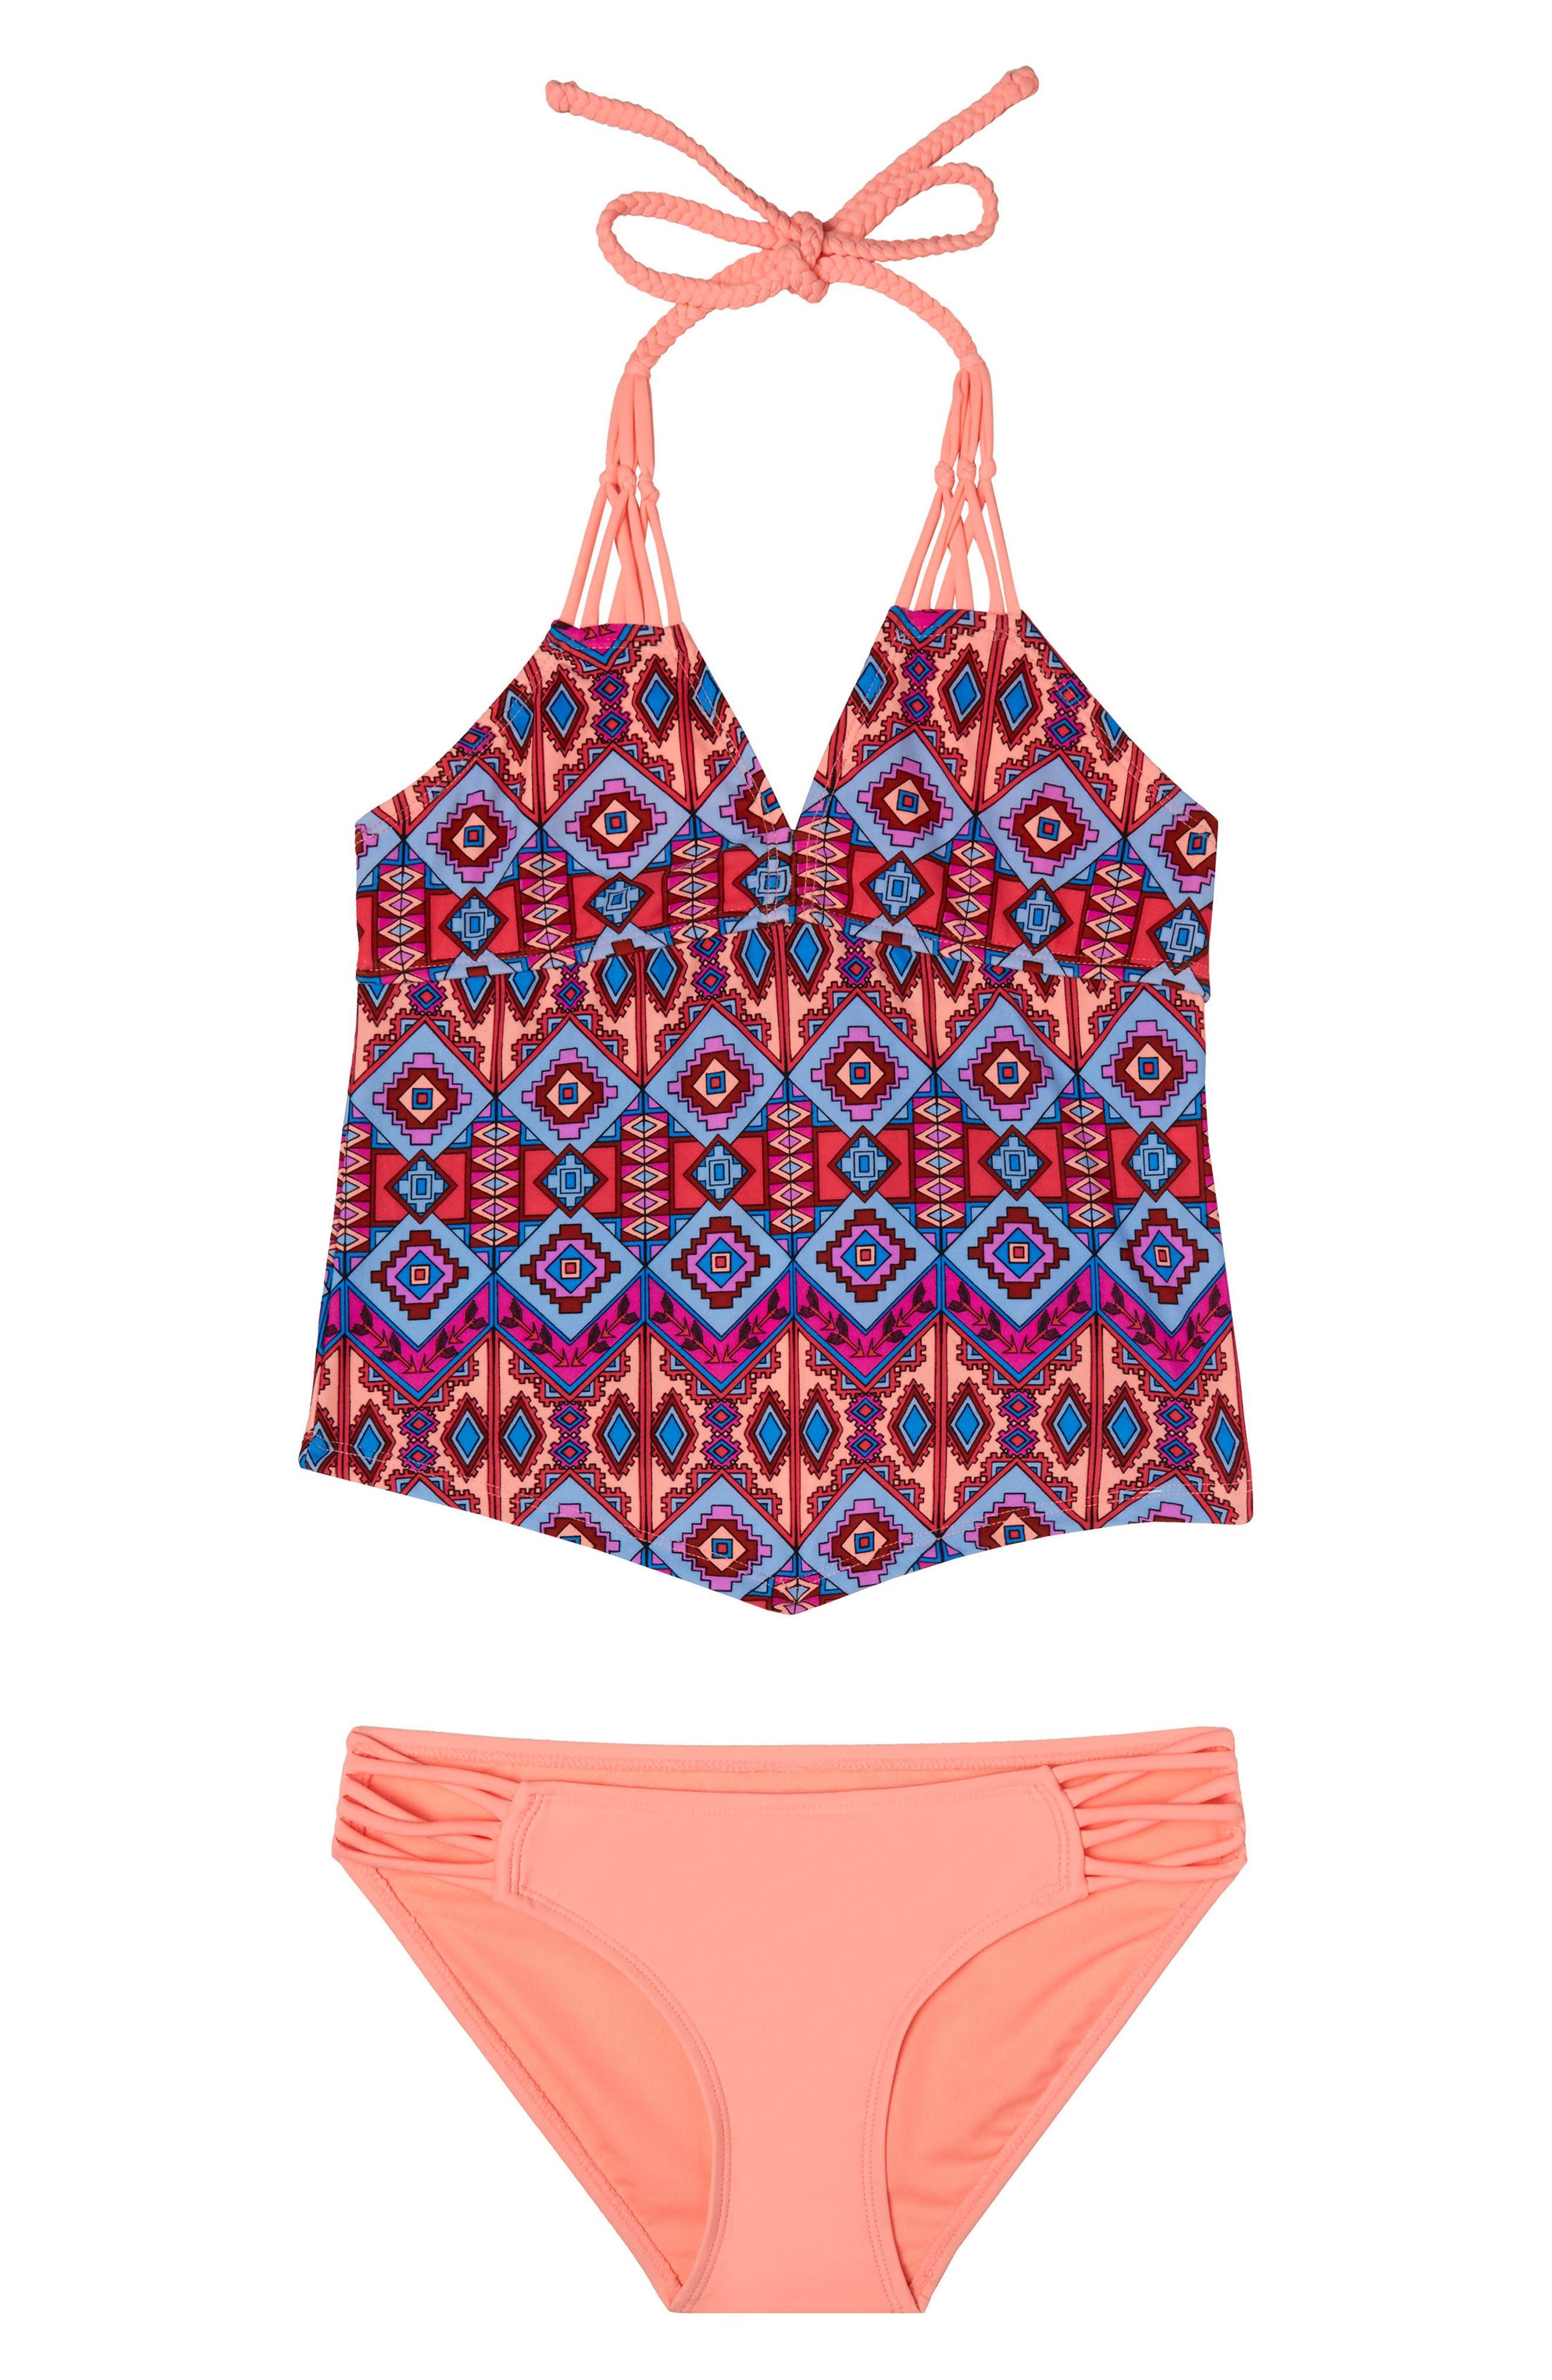 Brave Spirit Two-Piece Swimsuit,                             Main thumbnail 1, color,                             Coral